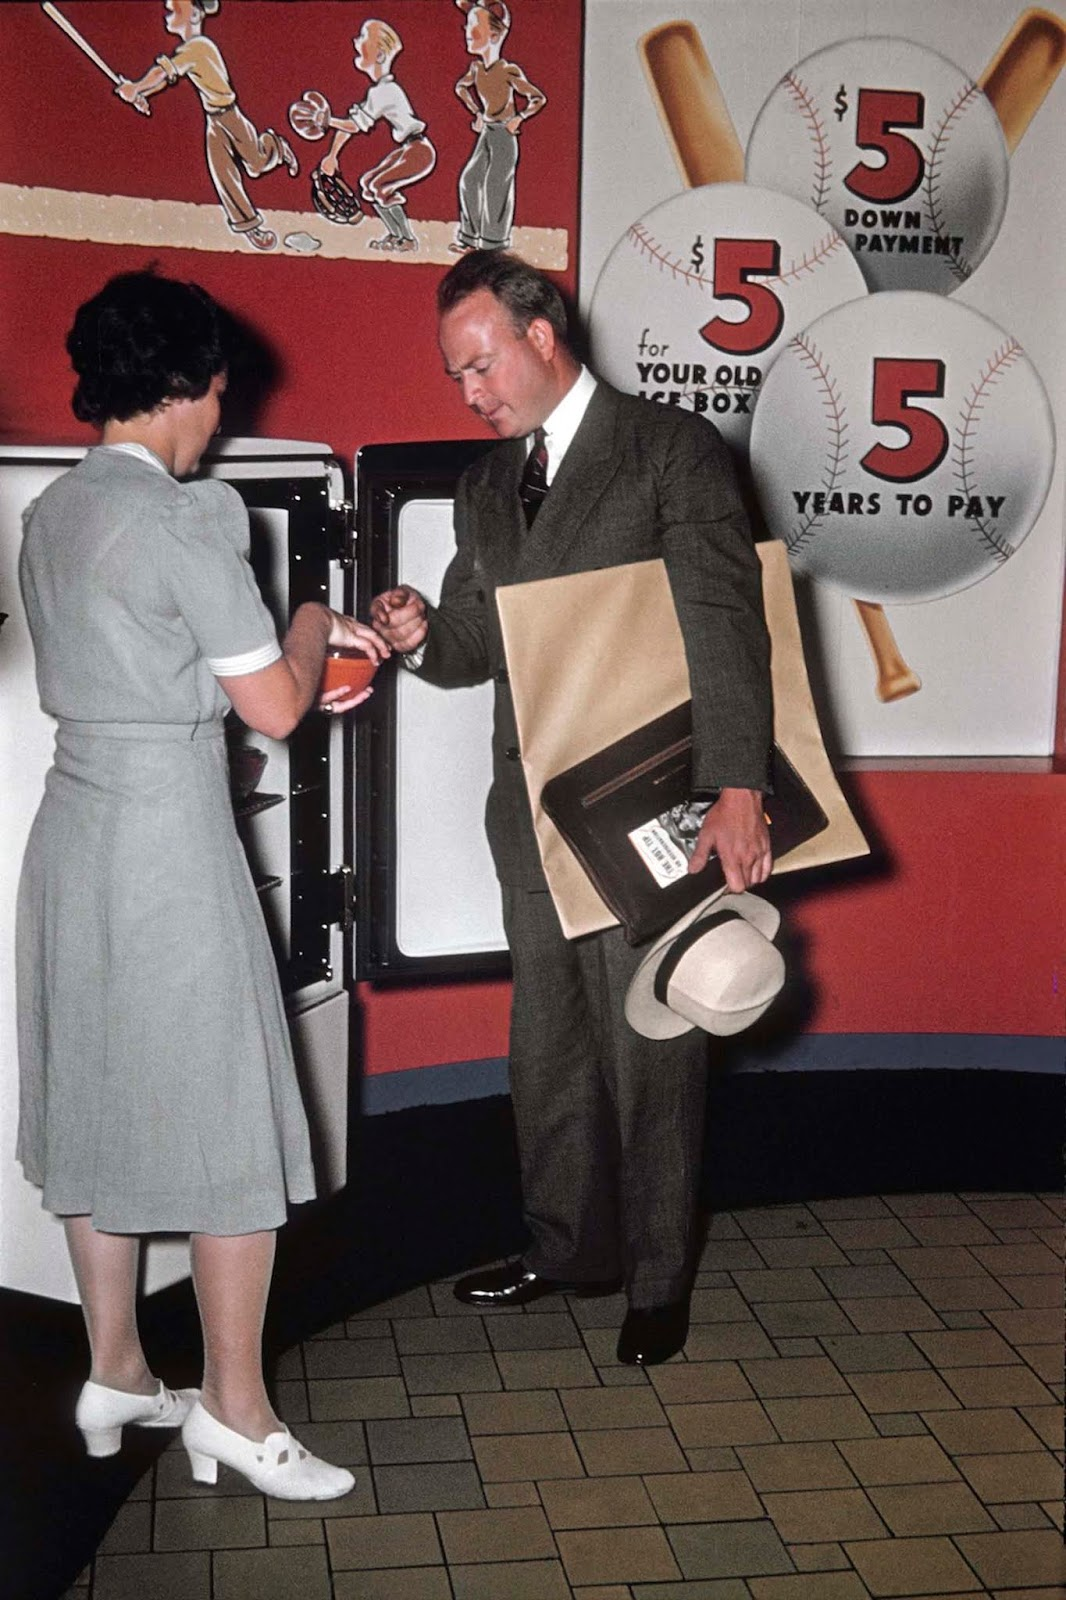 An ad man clutches the book